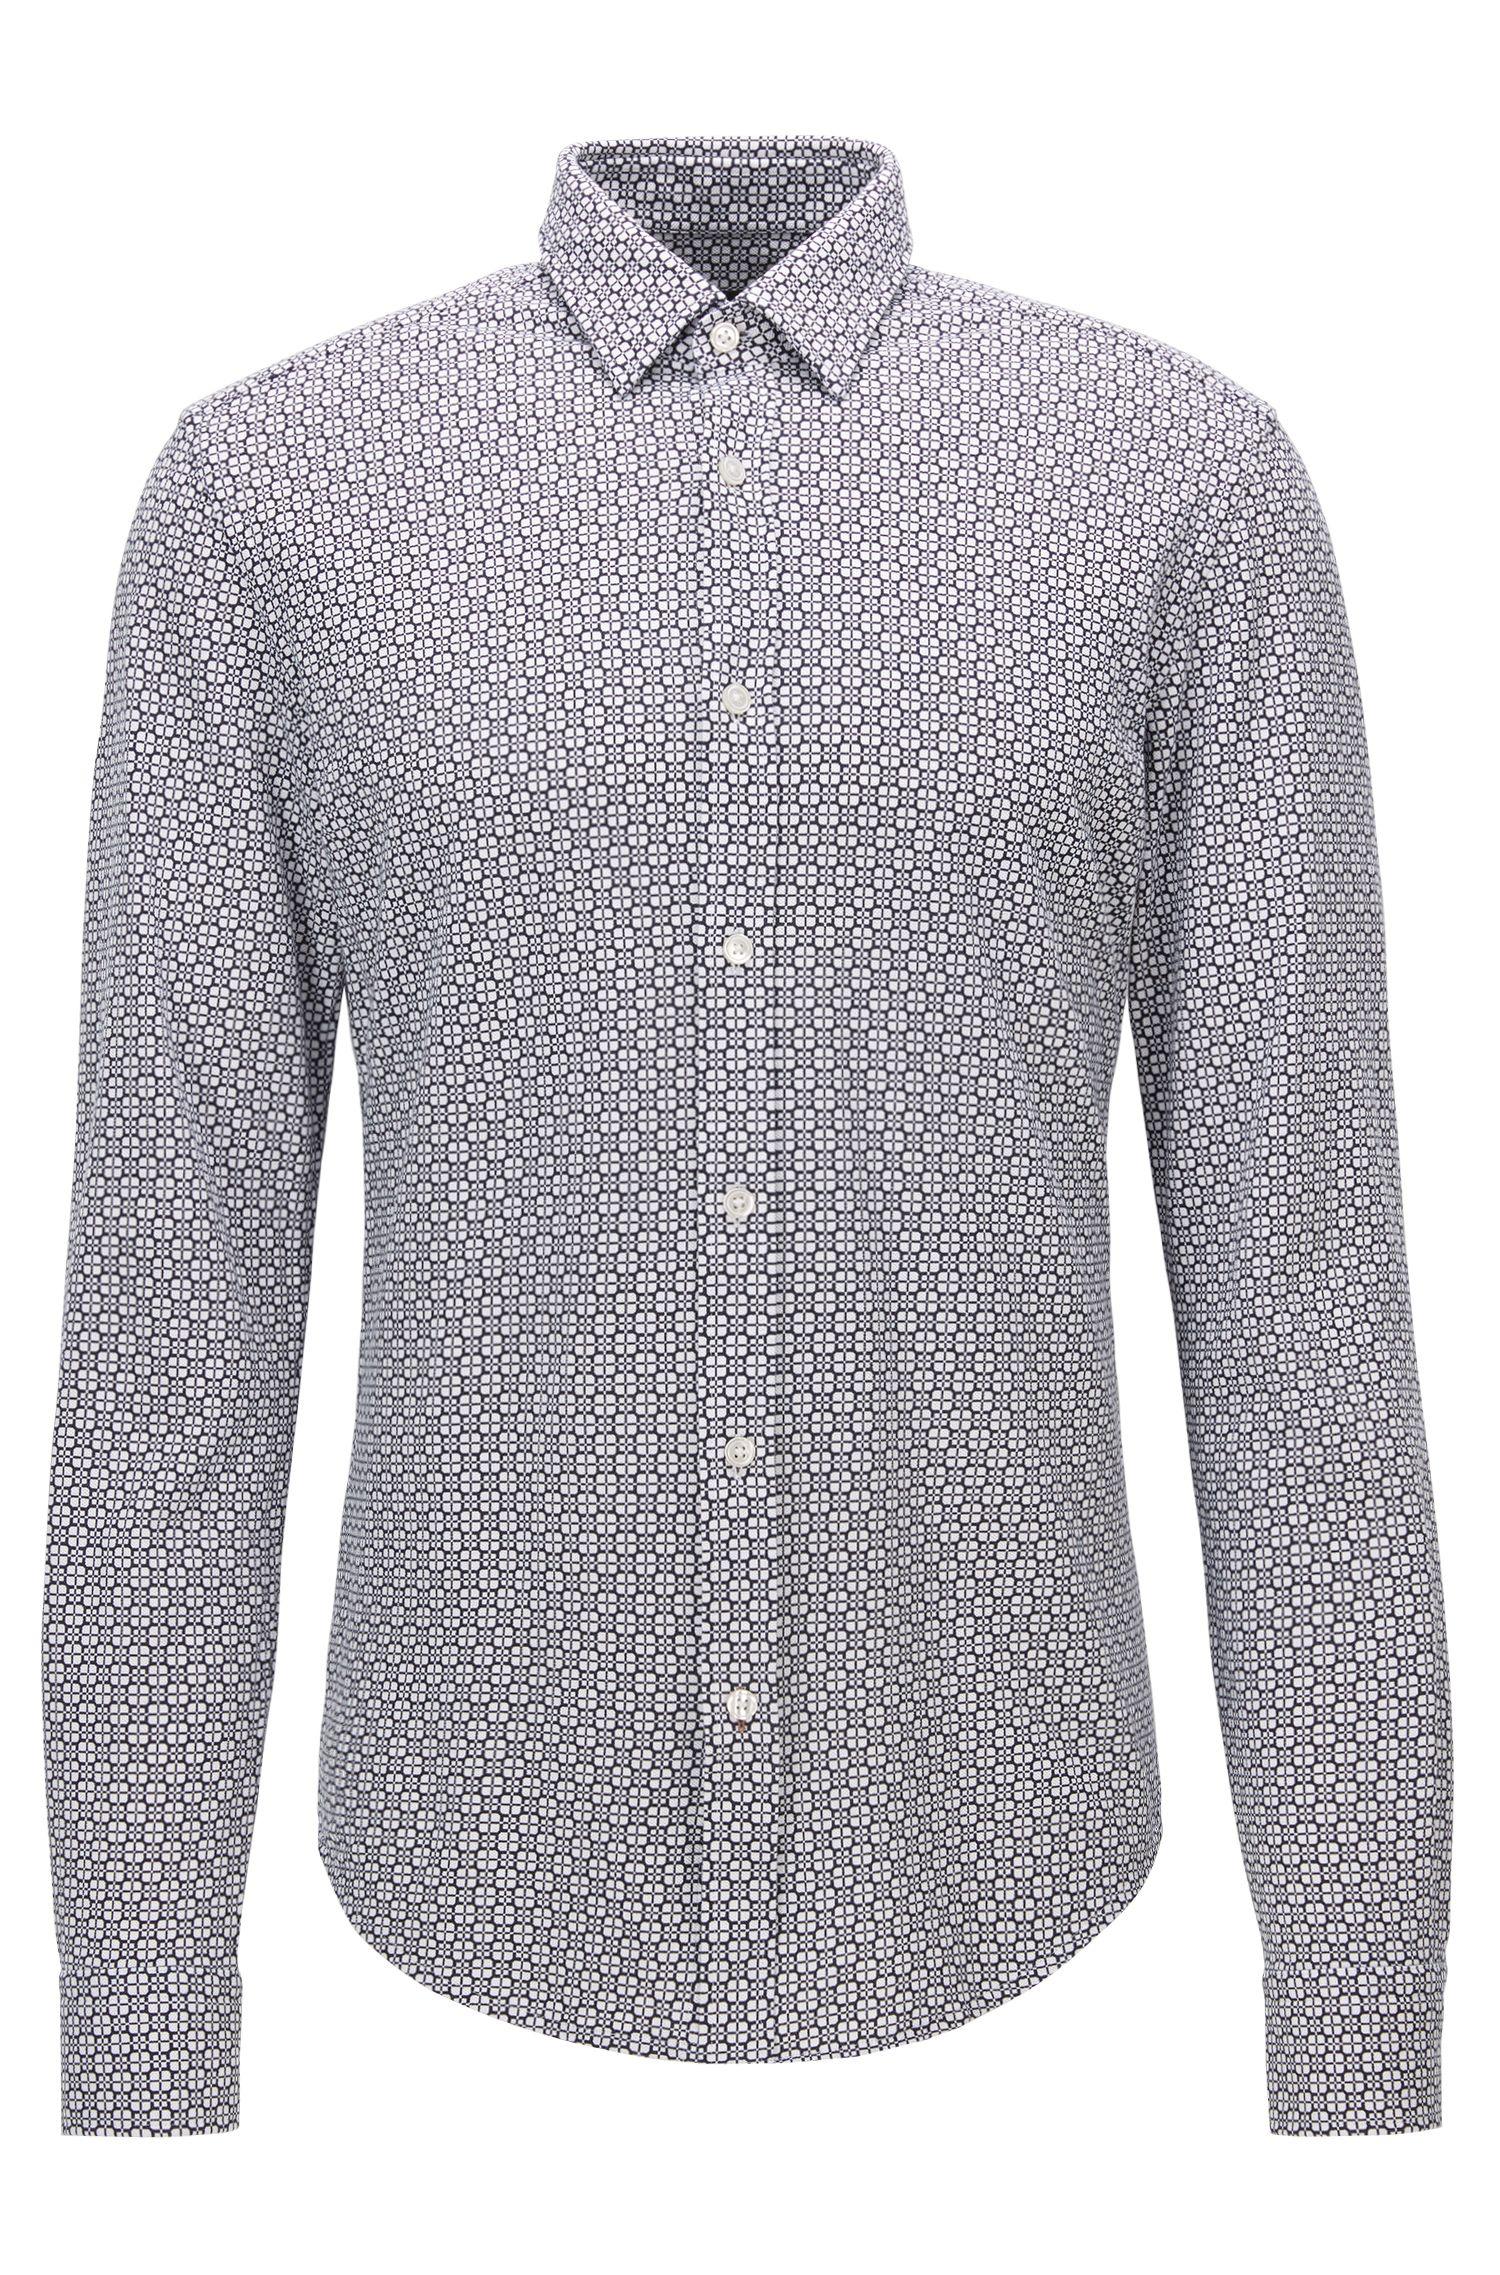 'Ronni' | Slim Fit, Square-Print Cotton Button Down Shirt